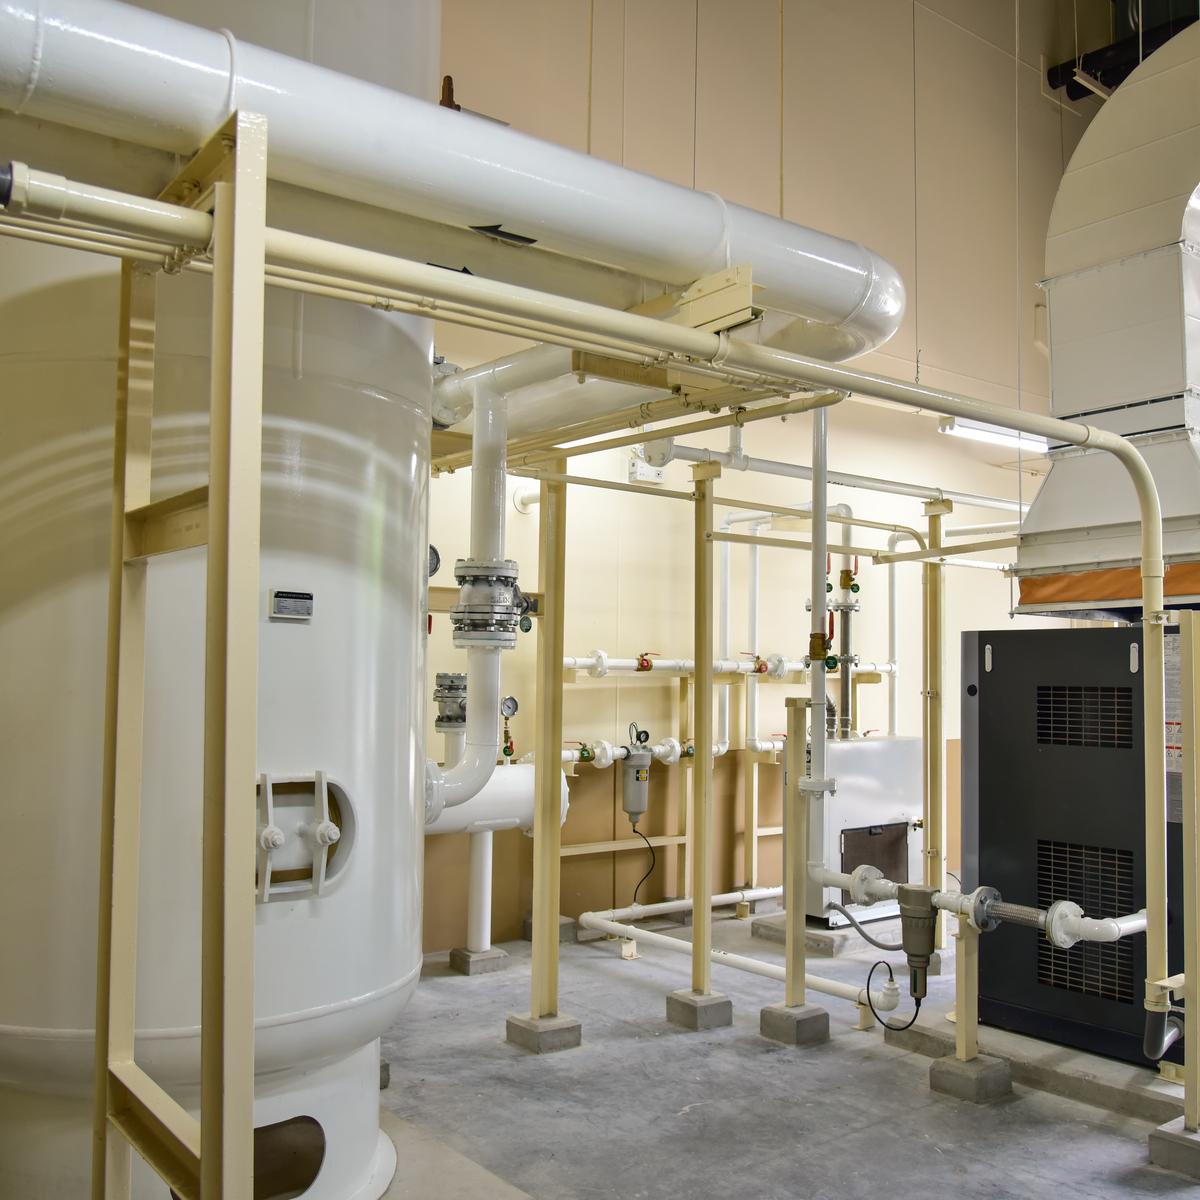 Summer Air Compressor Maintenance blog image